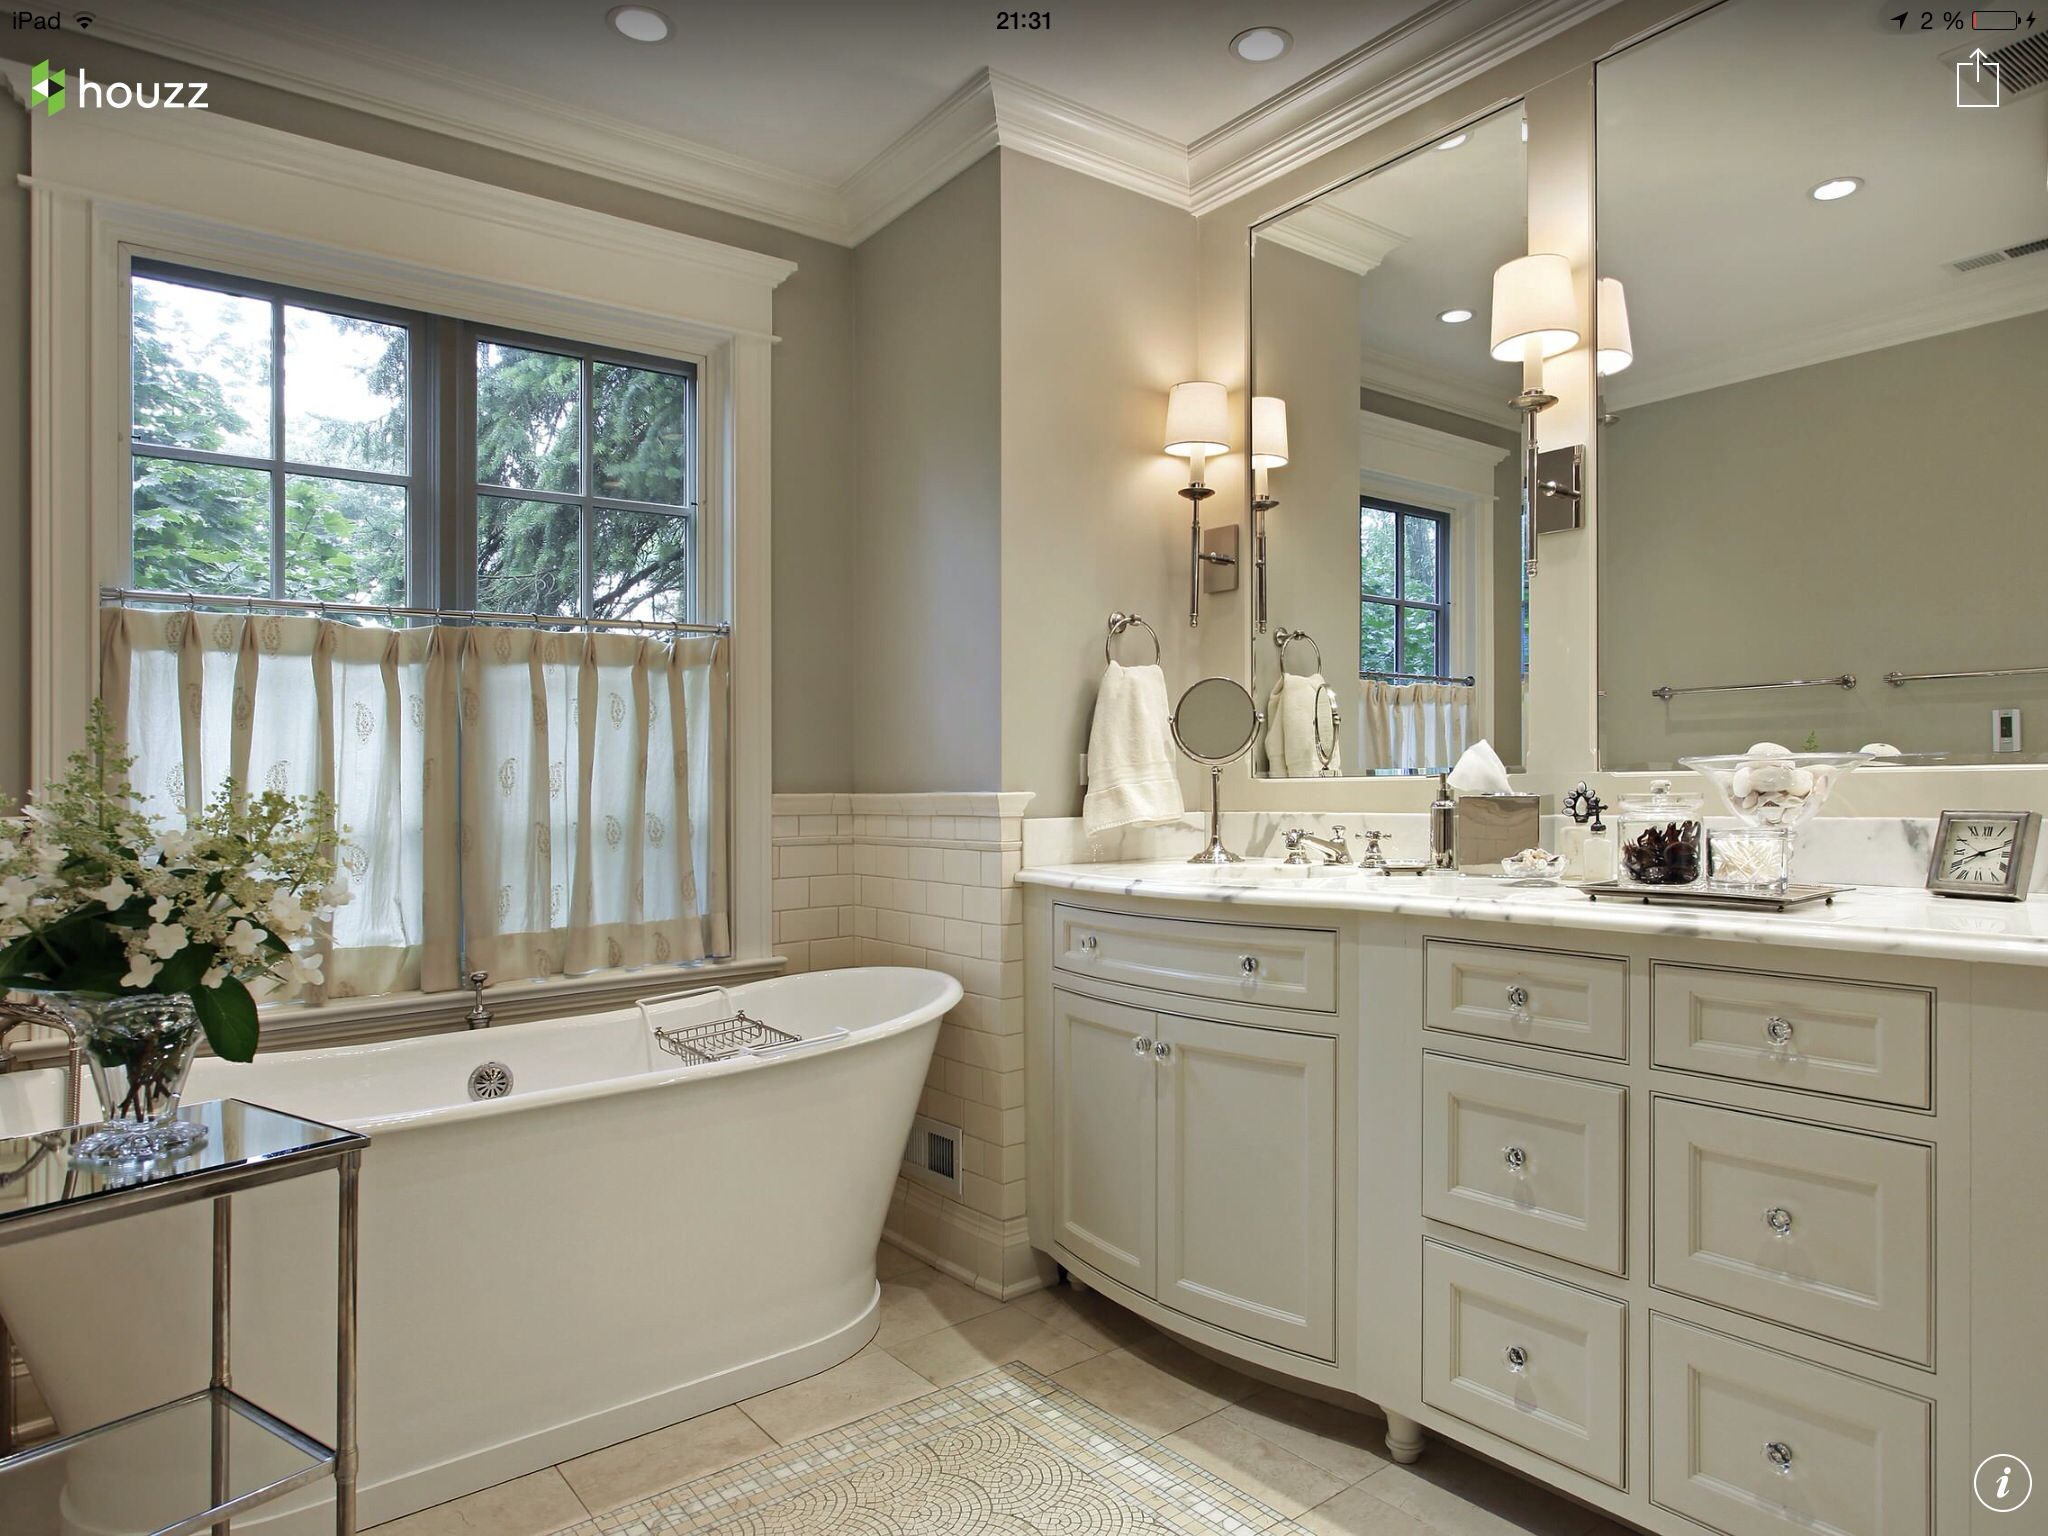 Zerkalo Svetilnik Vanna Stylish Bathroom Diy Bathroom Remodel Traditional Bathroom